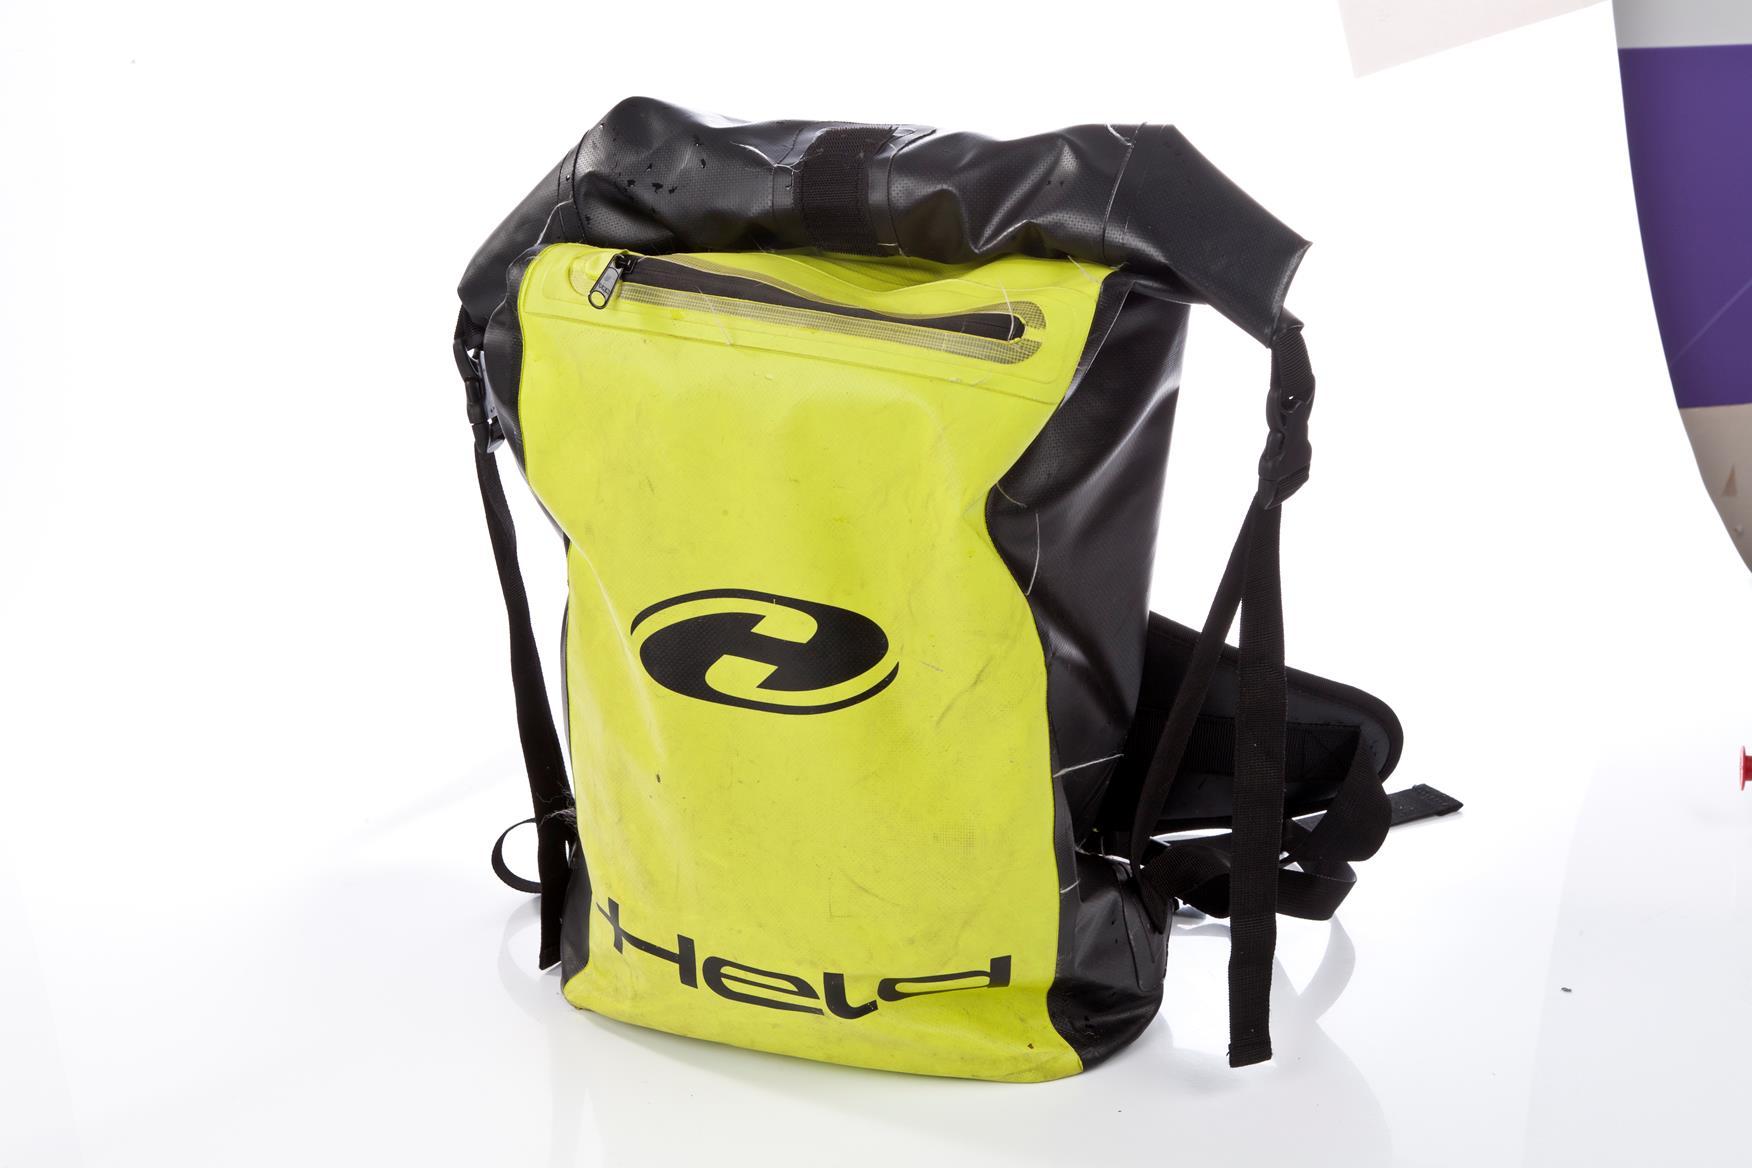 Product Review: Held Moto-Flash rucksack | MCN